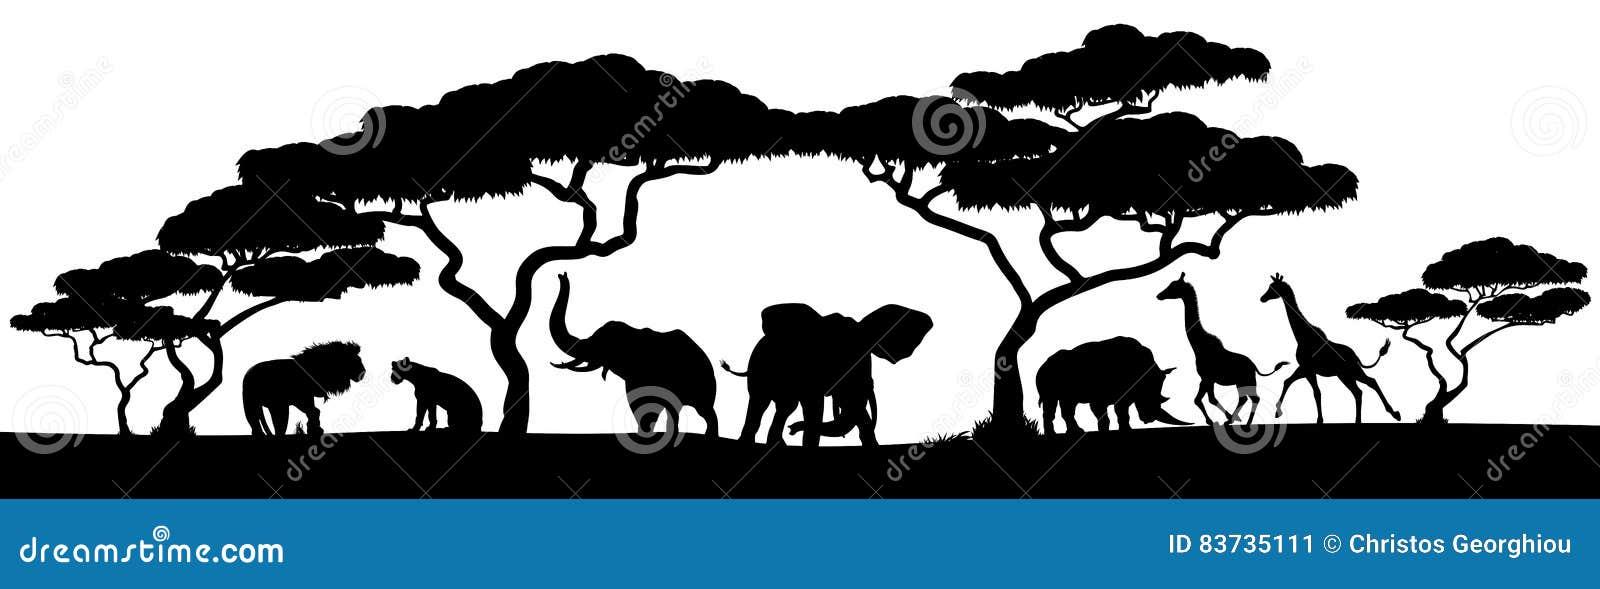 Schattenbild-Afrikaner Safari Animal Landscape Scene